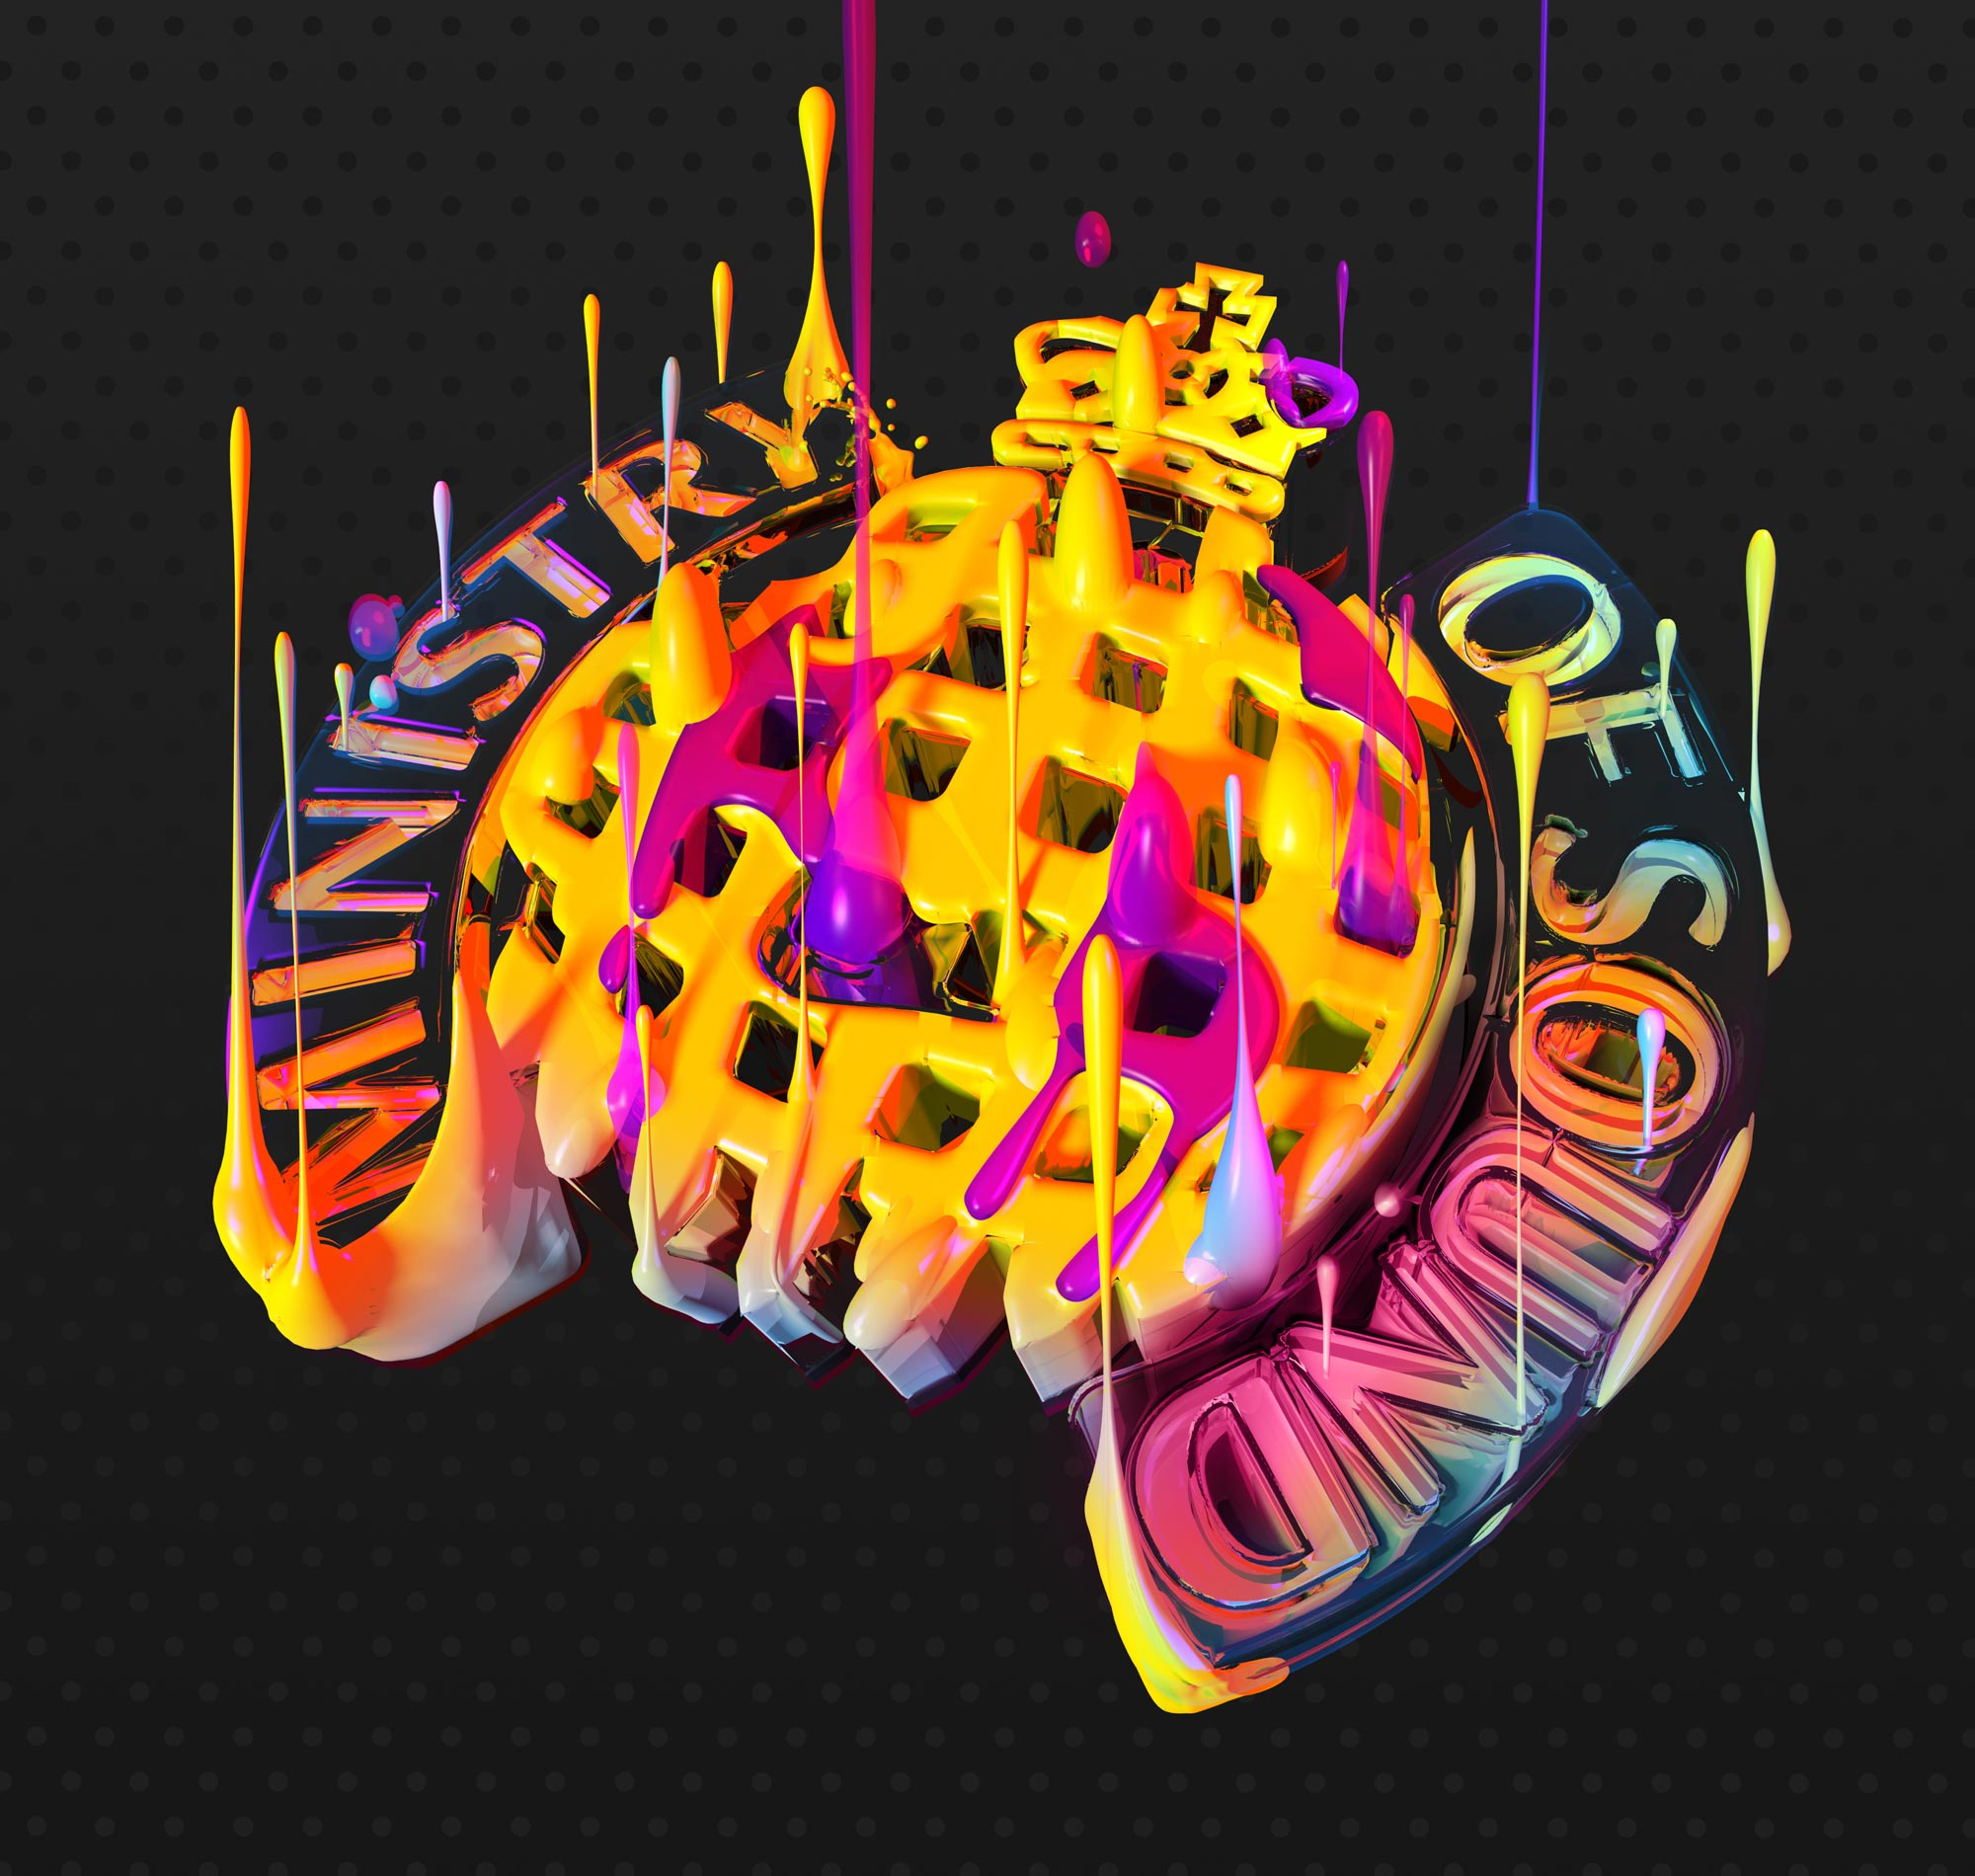 Bespoke design, 3D, ministry of sound